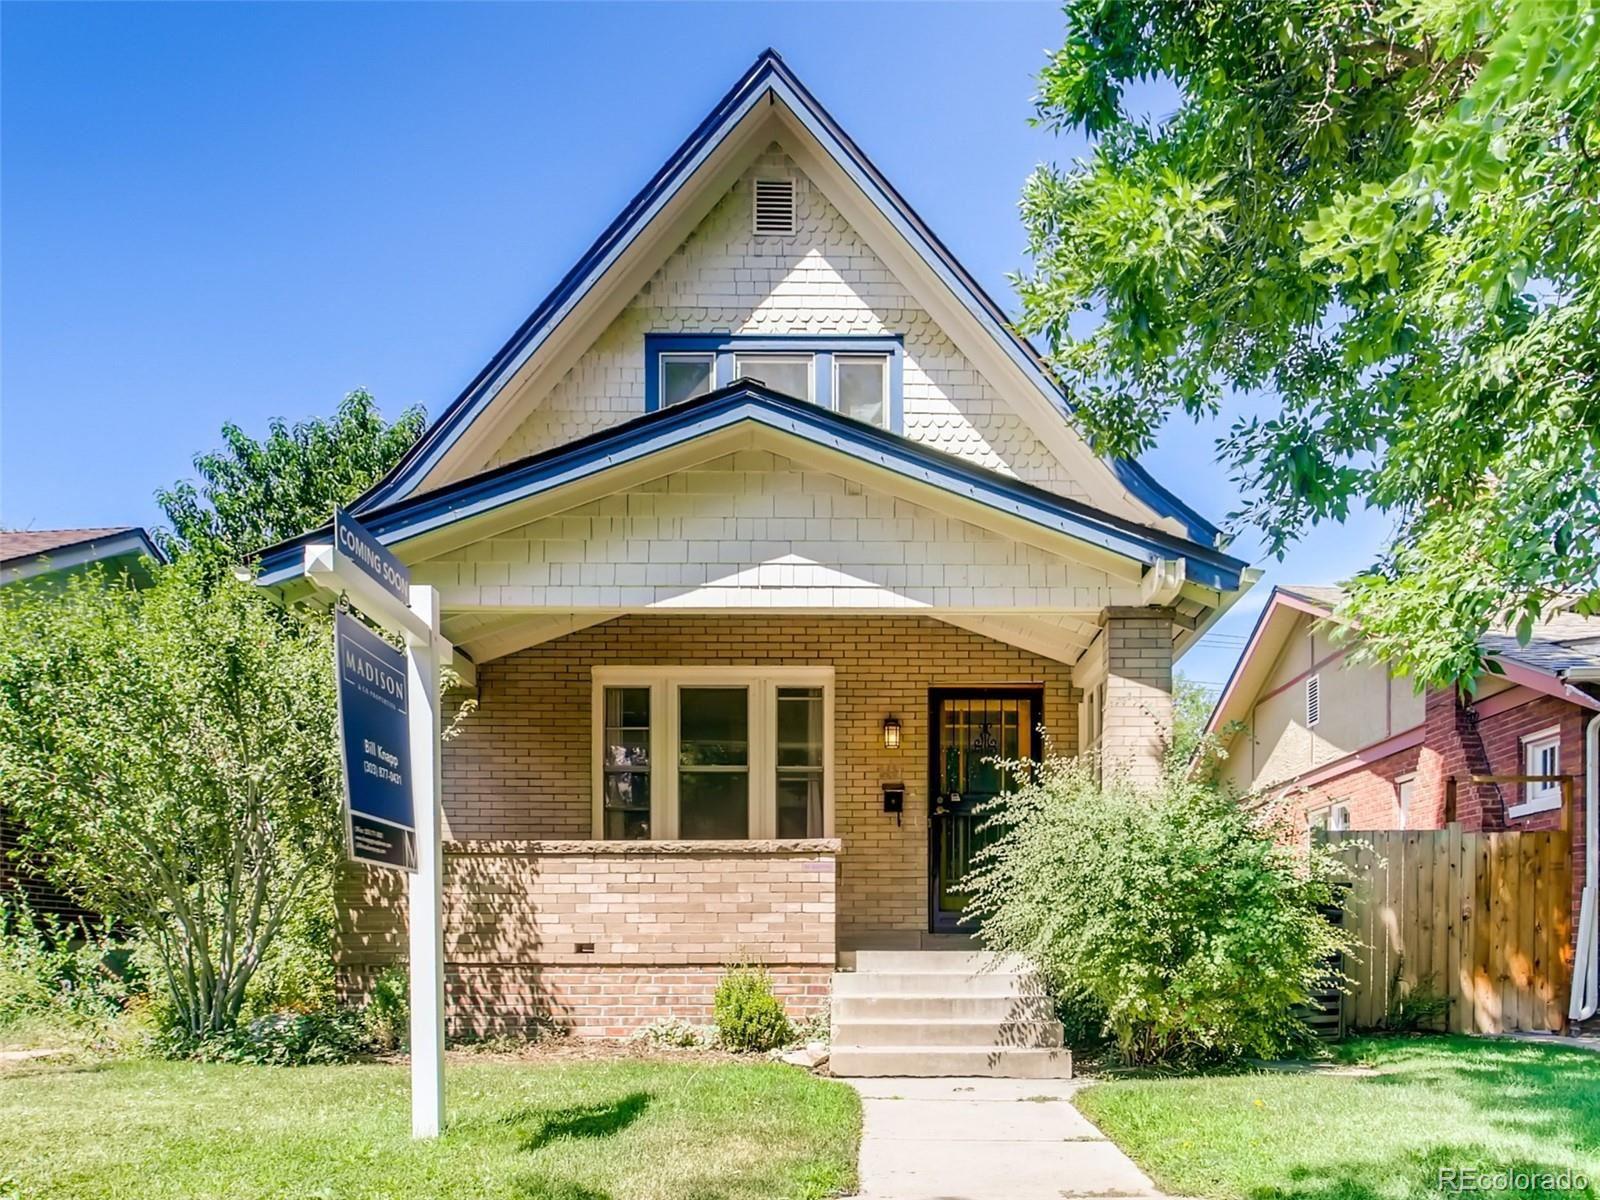 2531 Fairfax Street, Denver, CO 80207 - #: 8135864